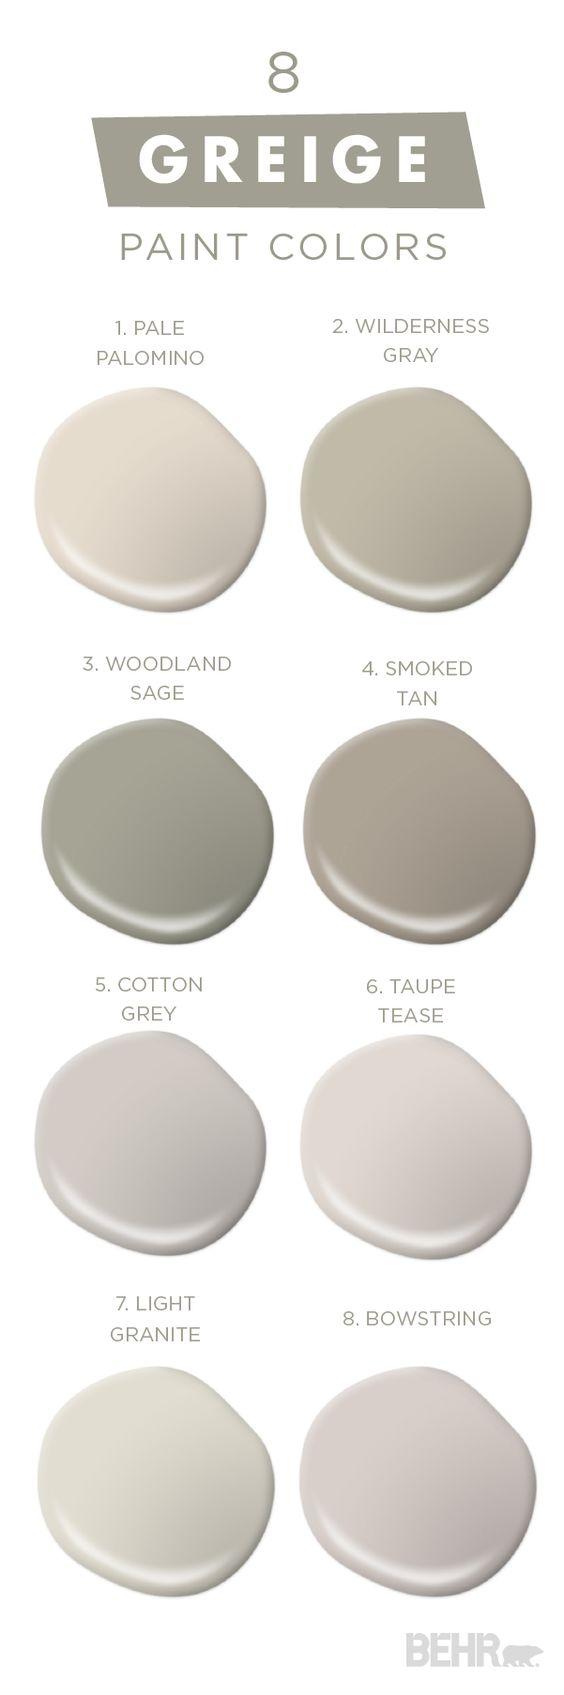 The best images about paint colors on pinterest exterior colors